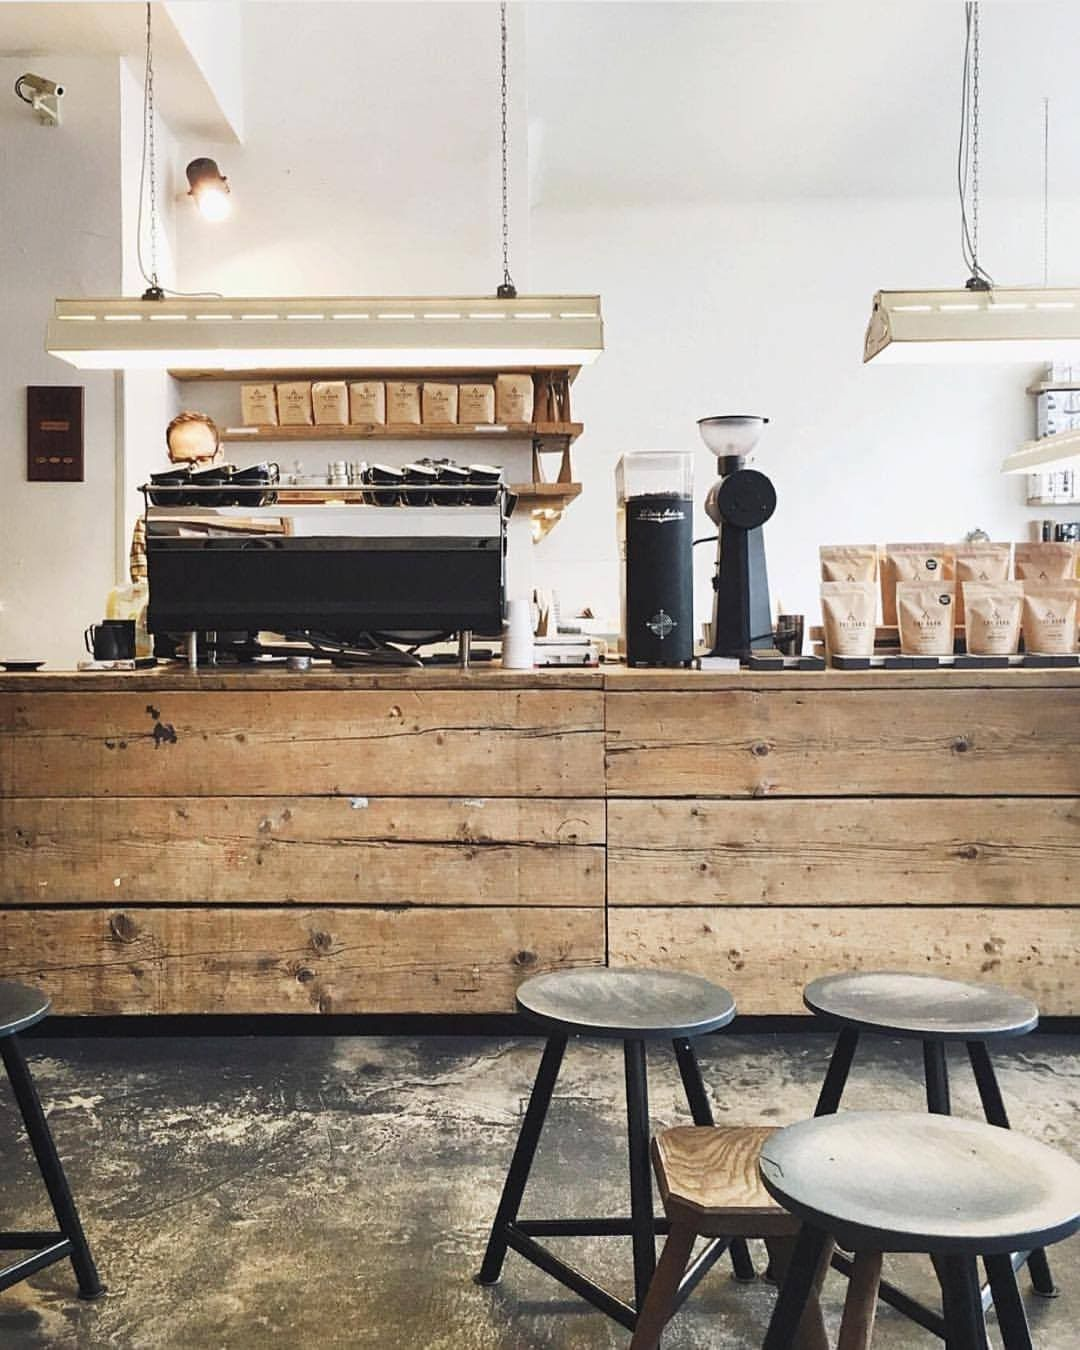 Acme & Co — Espresso bar at thebarnberlin dcily